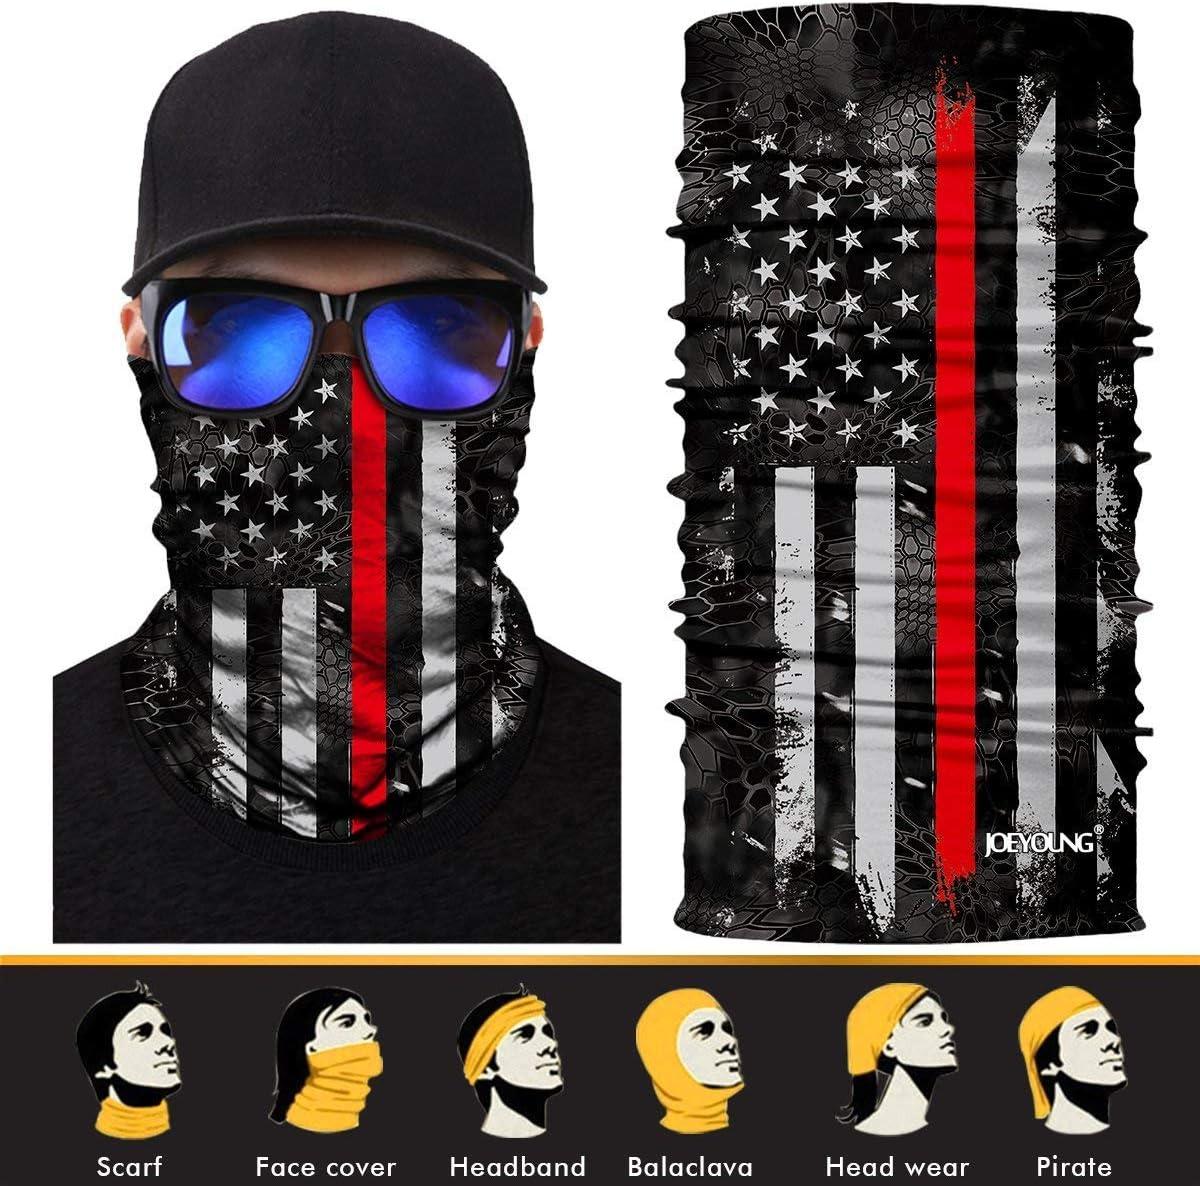 JOEYOUNG 3D Face Sun Mask, Neck Gaiter, Headwear, Magic Scarf, Balaclava, Bandana, Headband Fishing, Hunting, Yard Work, Running, Motorcycling, UV Protection, Great for Men & Women